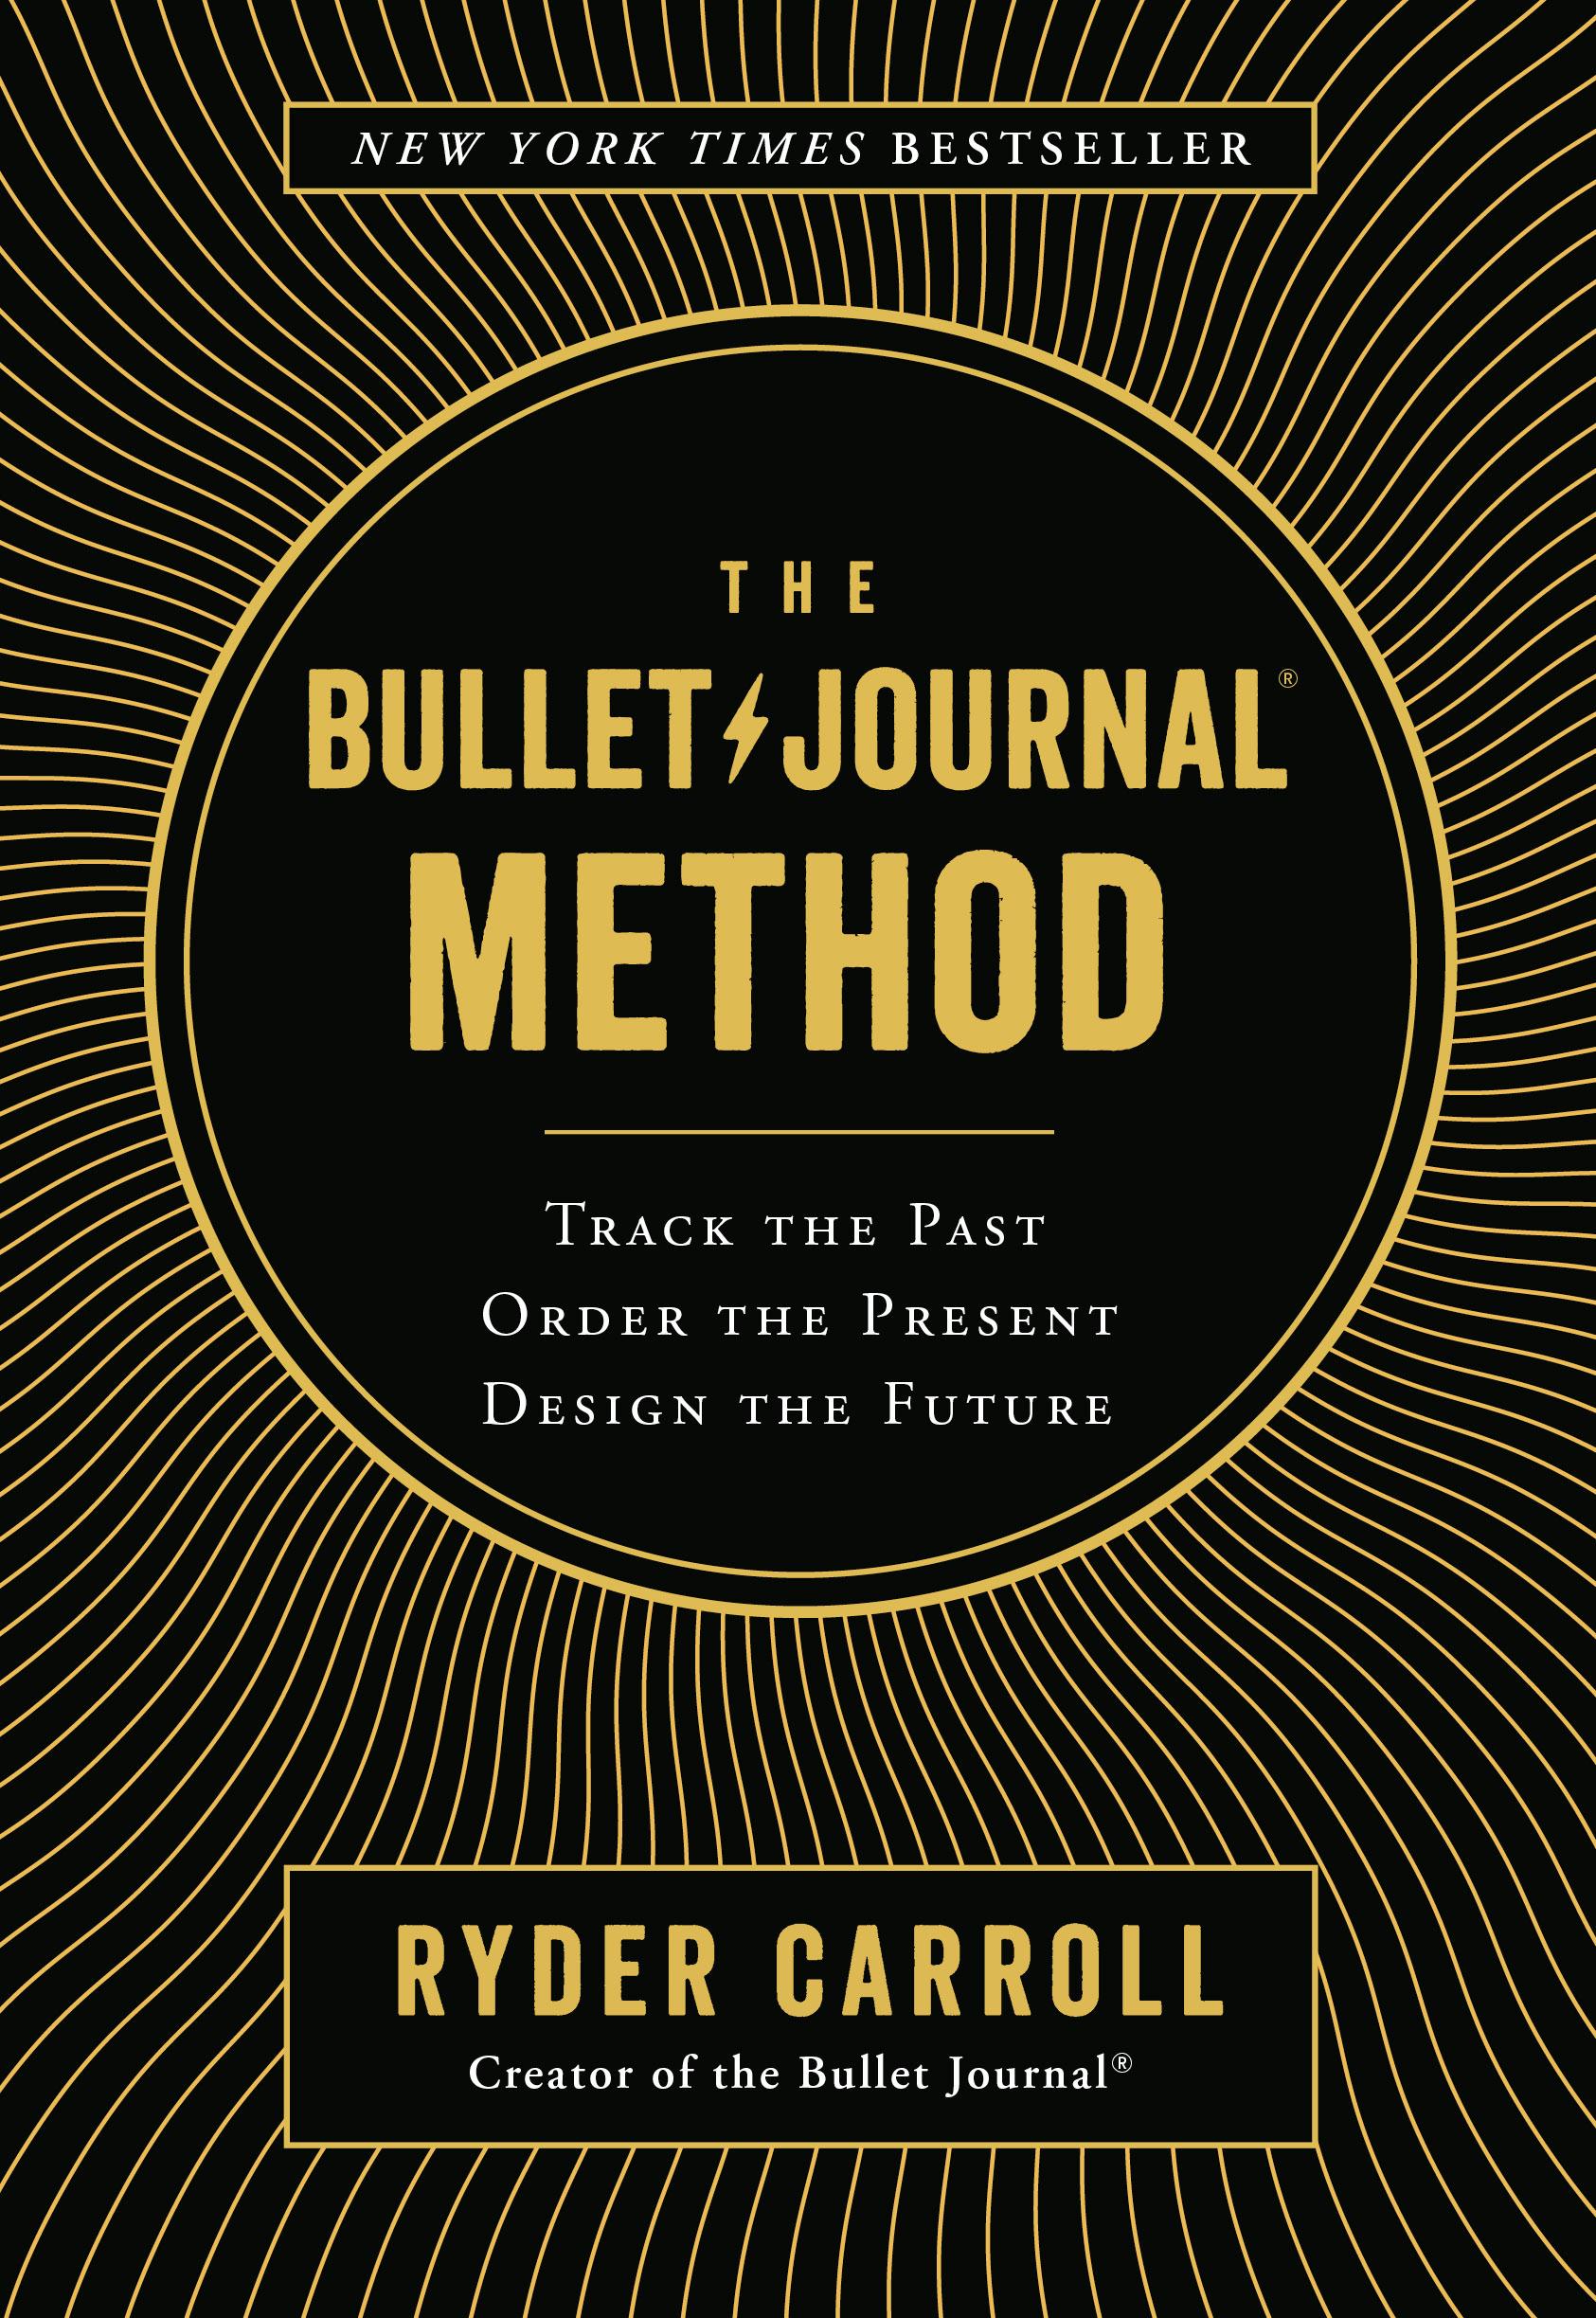 Download Ebook The Bullet Journal Method by Ryder Carroll Pdf